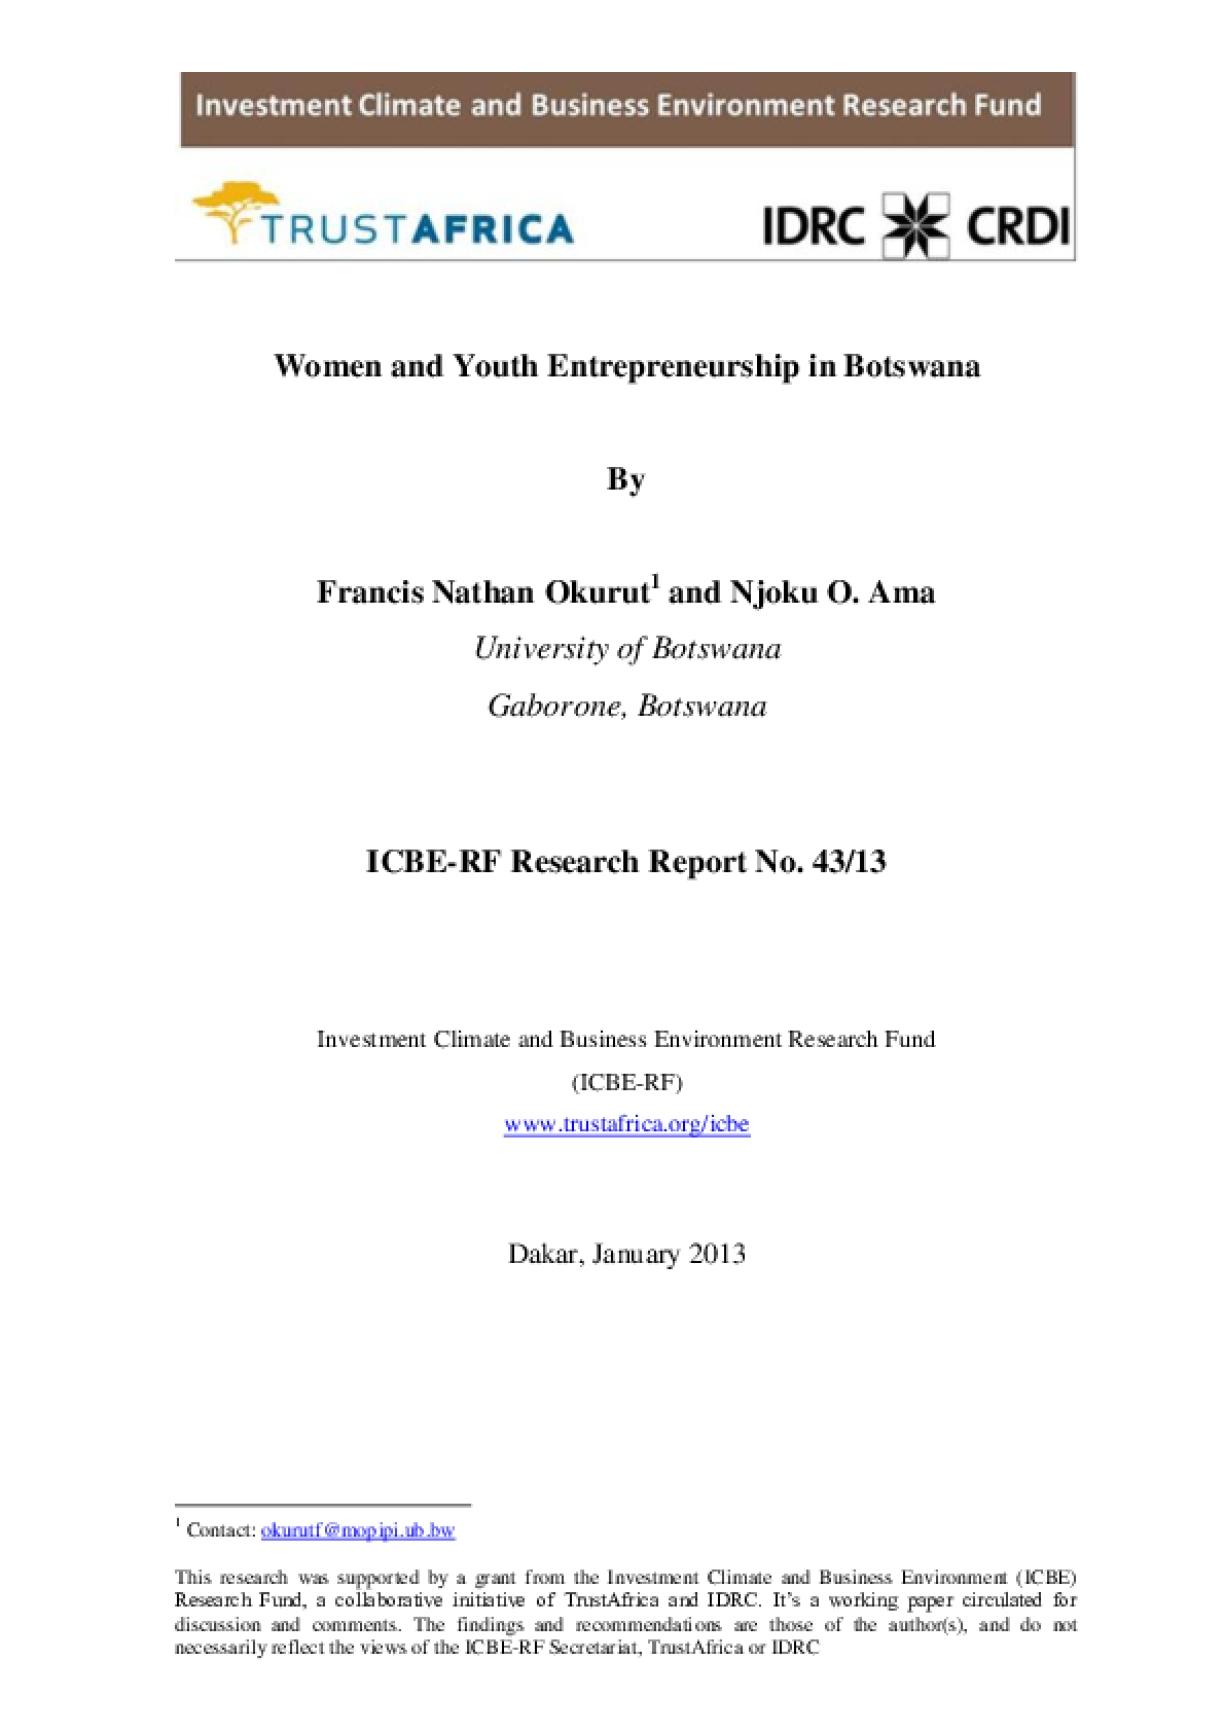 Women and Youth Entrepreneurship in Botswana